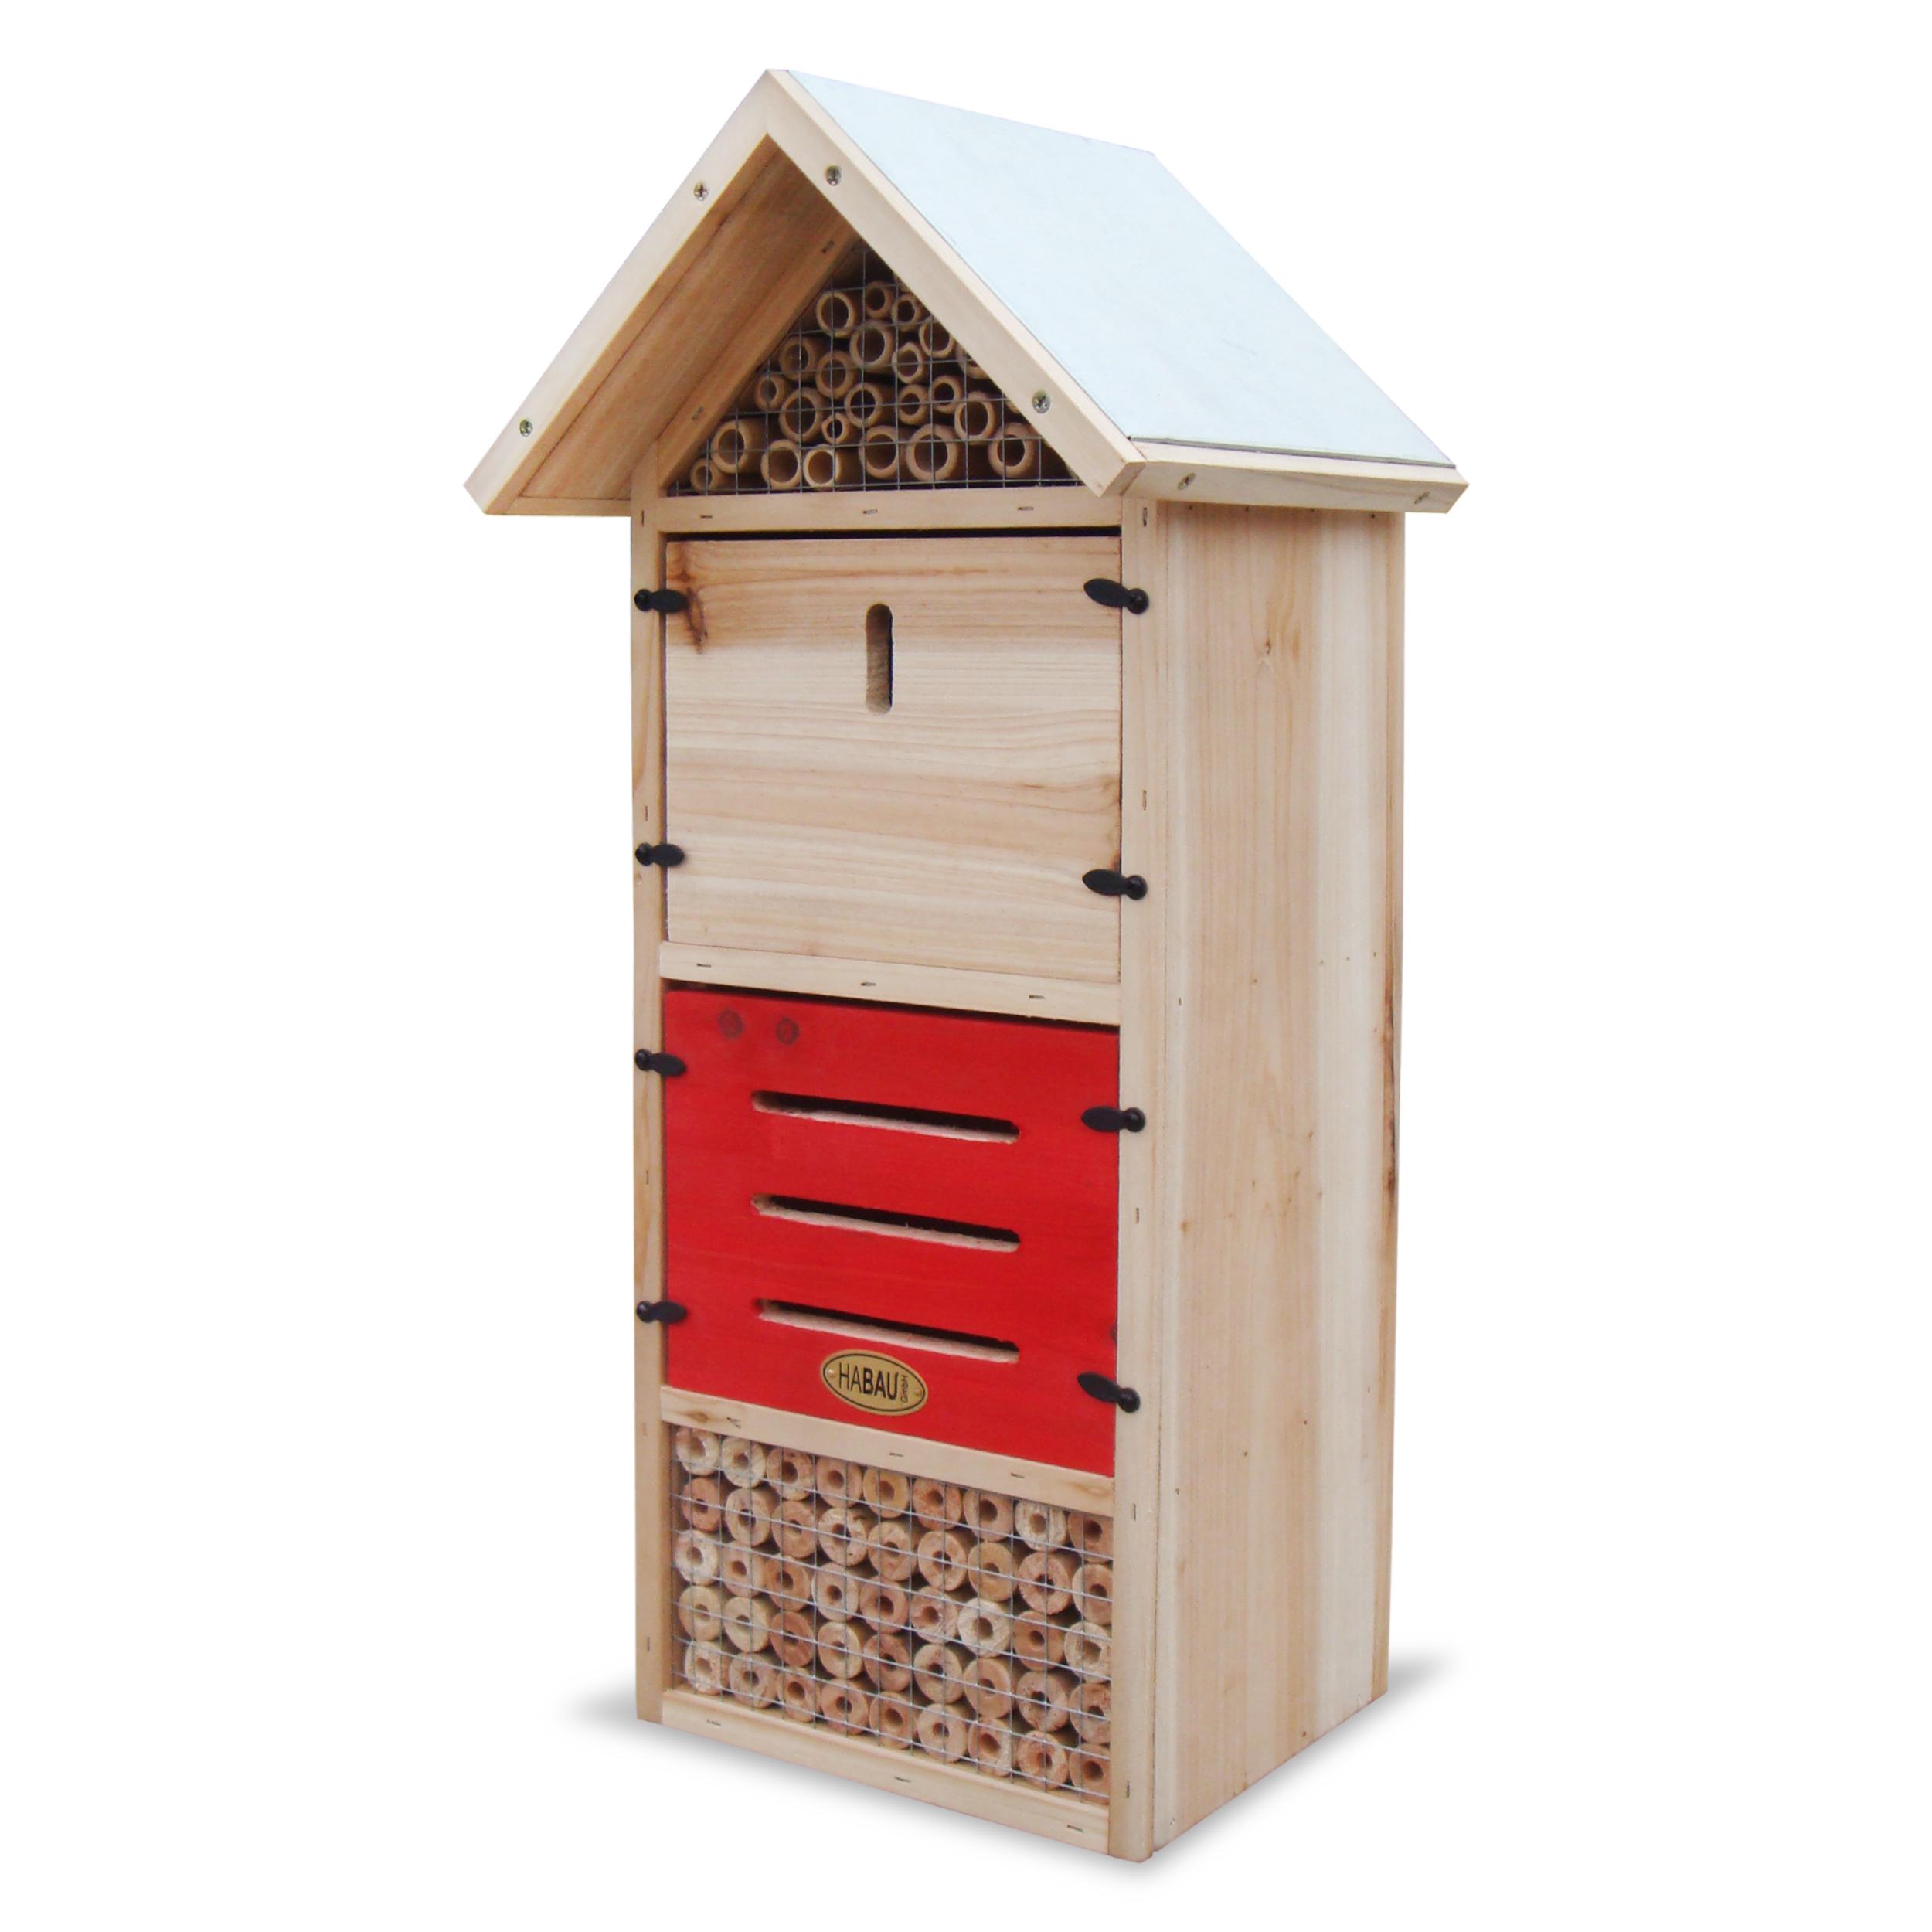 HABAU Insektenhotel Kompakt - 3008